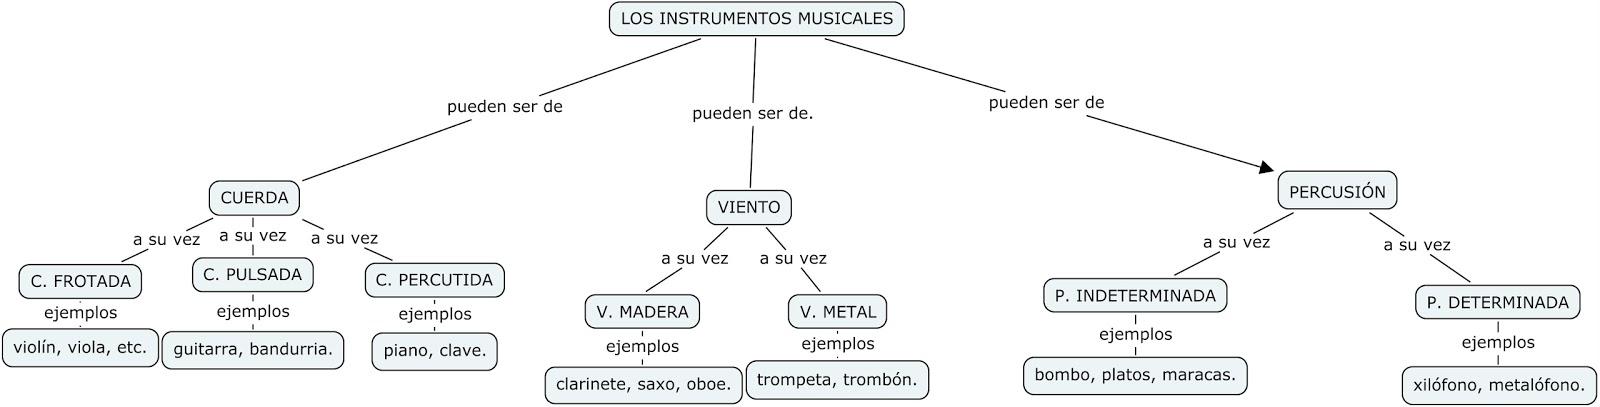 instrumentos musicales mapa conceptual | Educartisticas